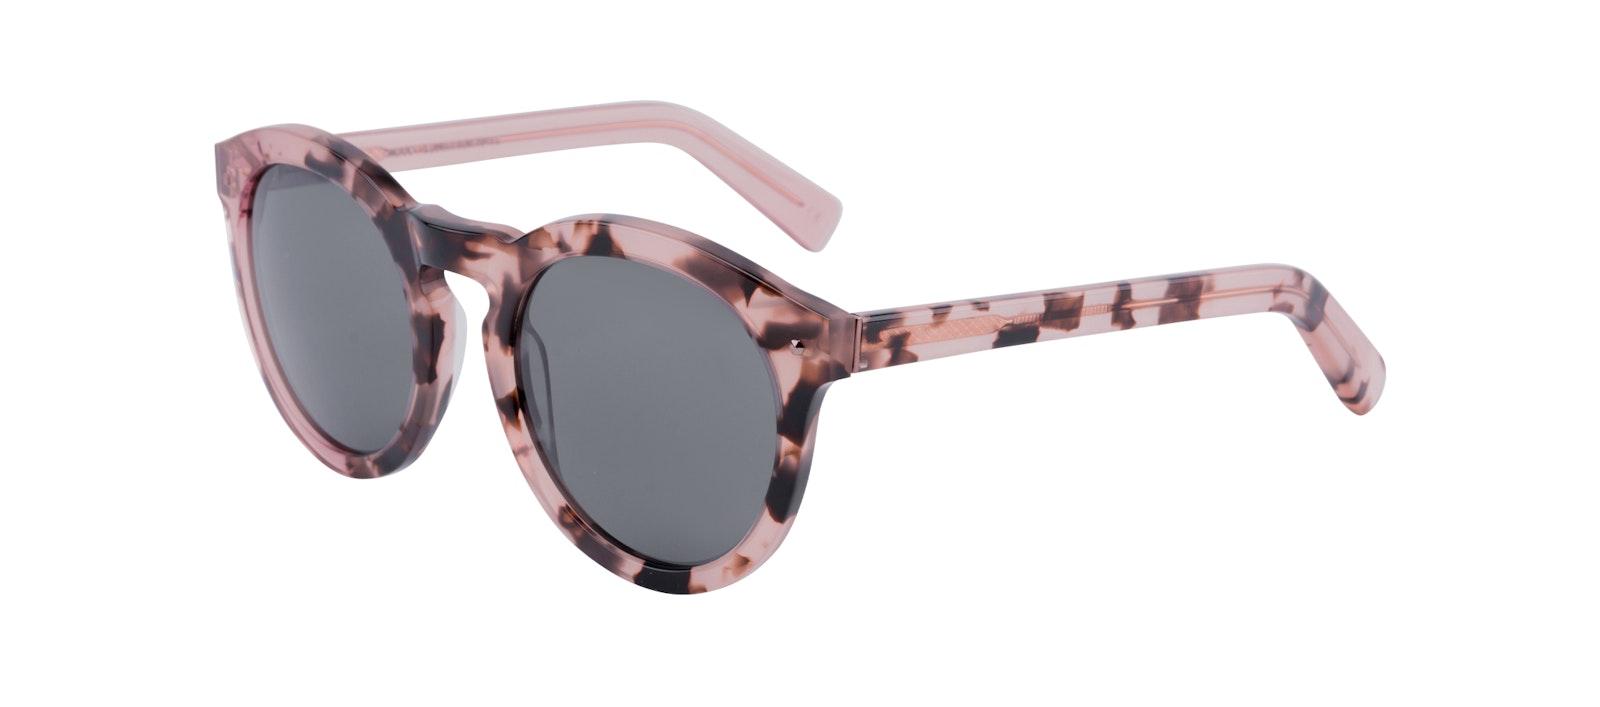 Affordable Fashion Glasses Round Sunglasses Women Mood Blush Tortoise Tilt